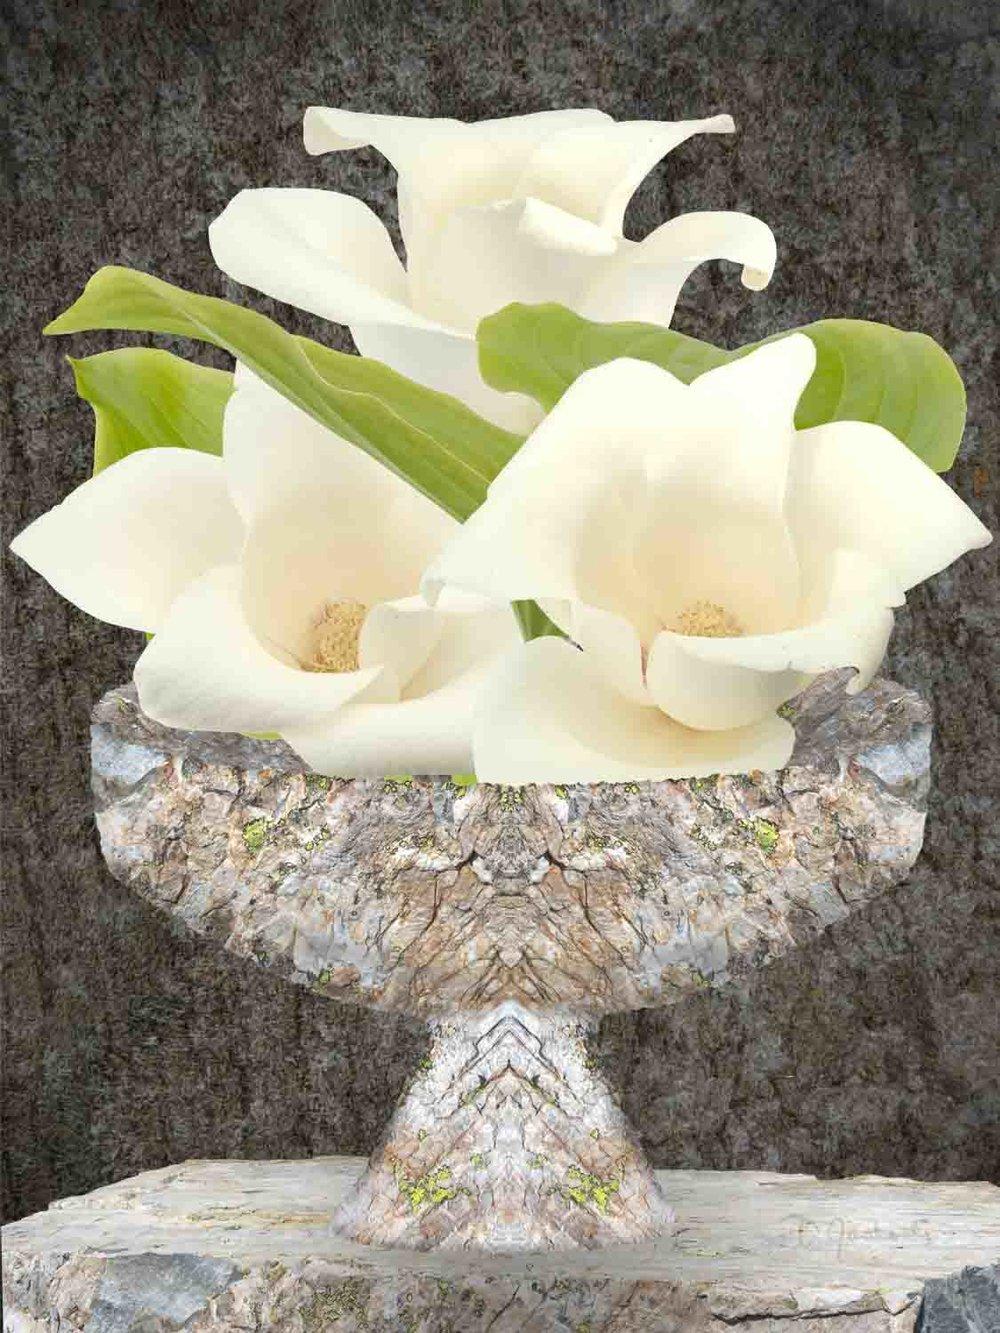 Magnolias With the Sedimentary Rock Vase